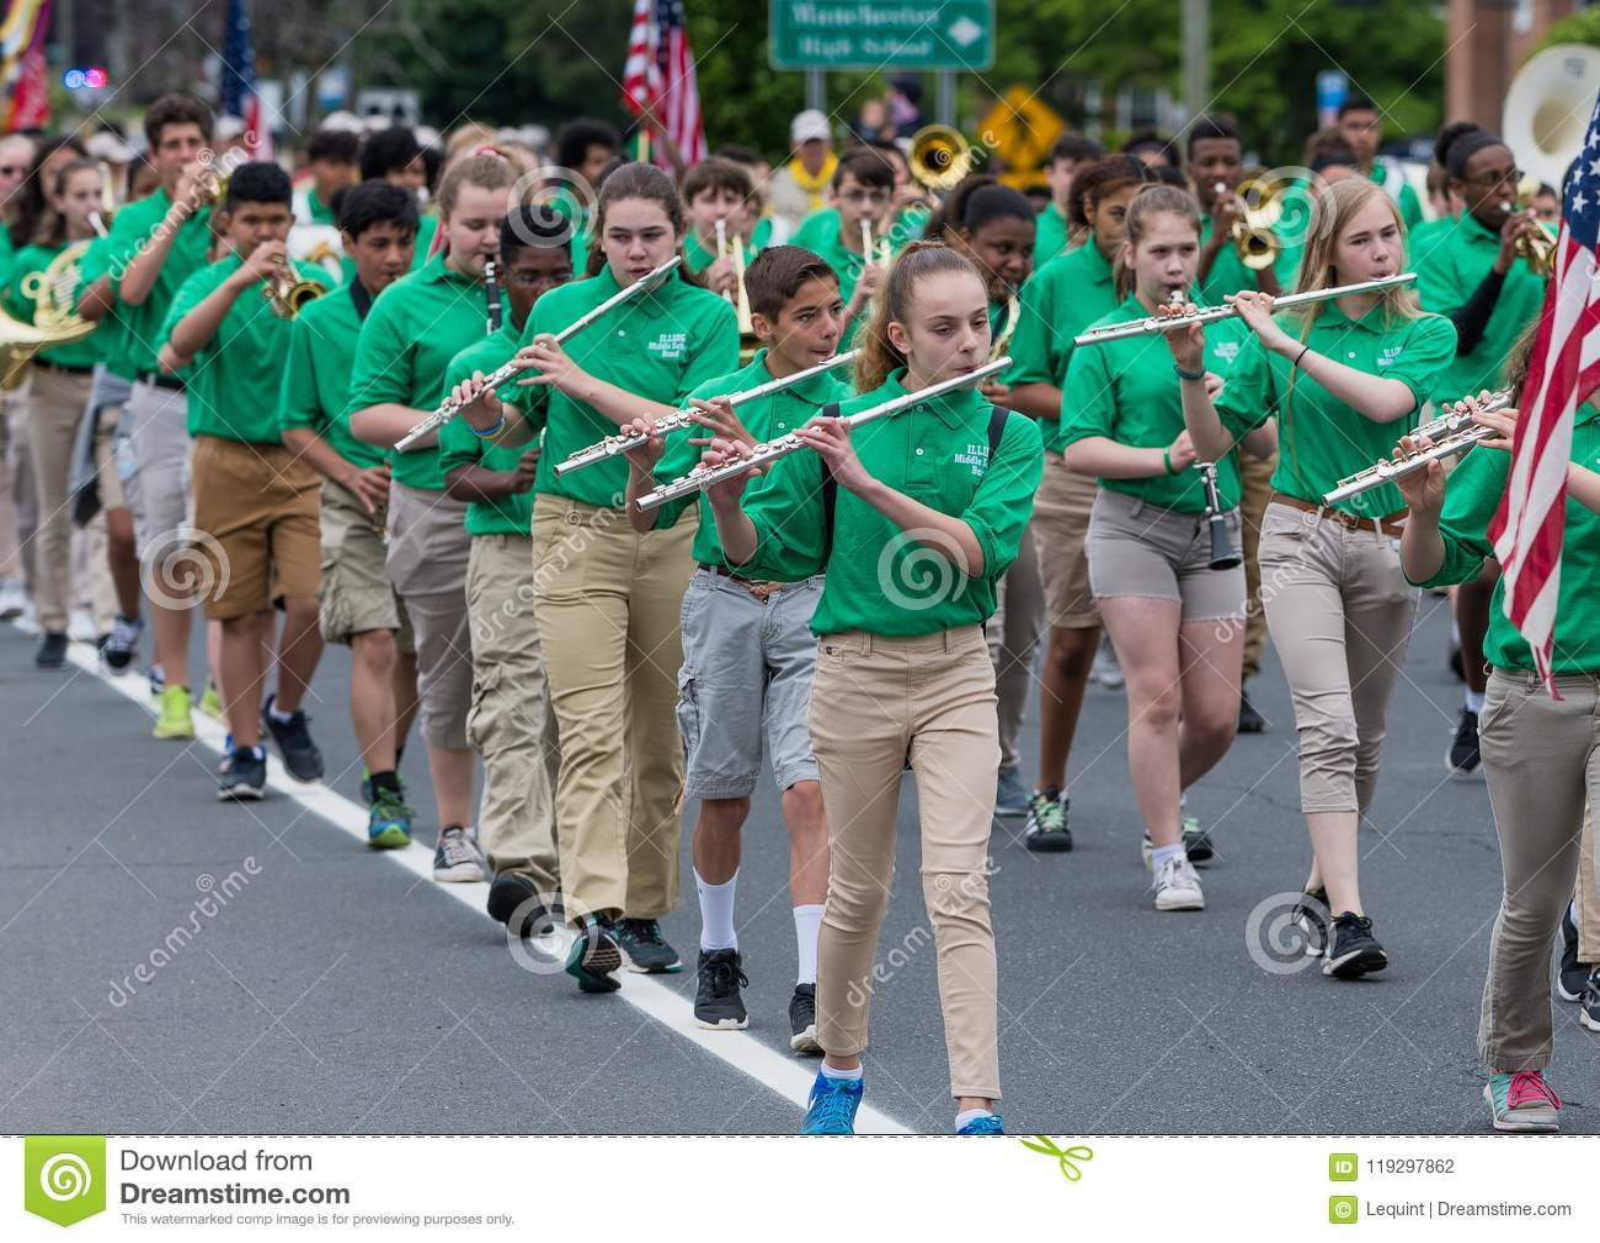 Manchester Connecticut High School Band In Green Uniform Editorial